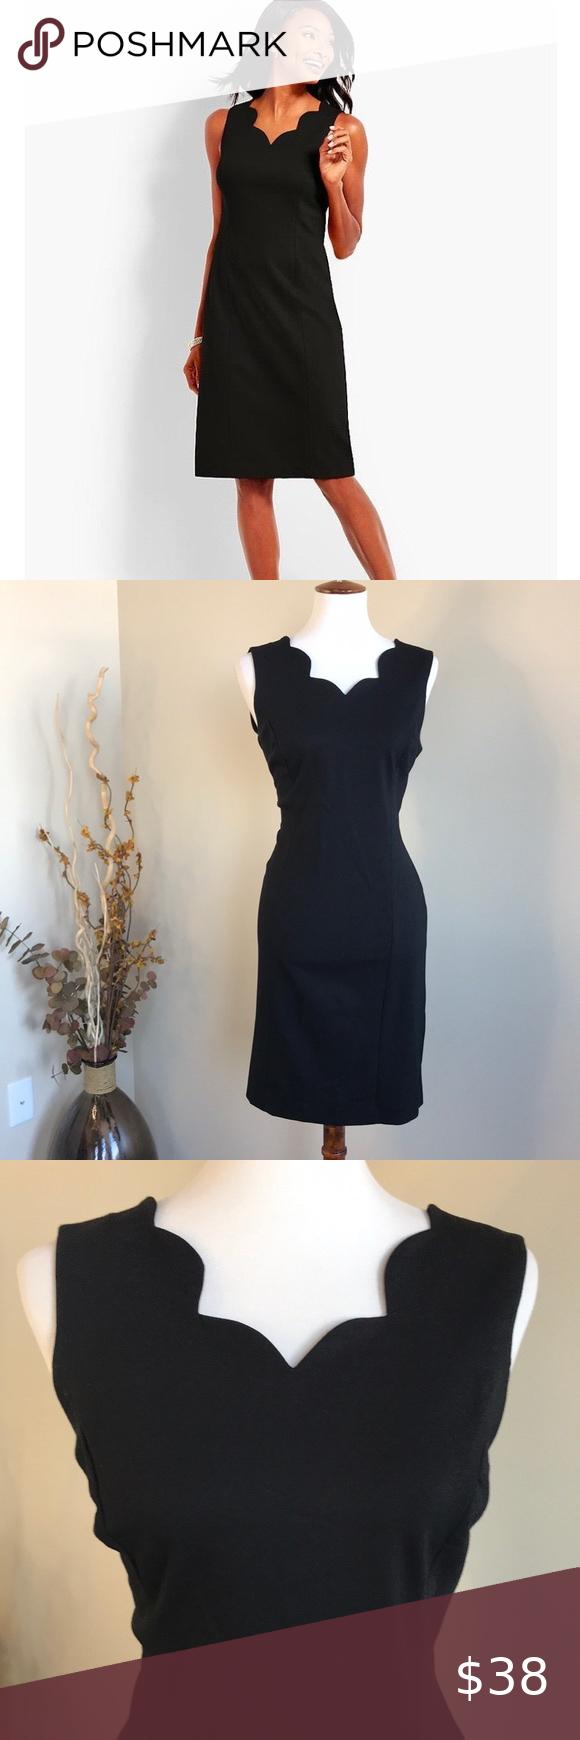 Talbots Black Dress W Scalloped Neckline Fashion Beautiful Black Dresses Clothes Design [ 1740 x 580 Pixel ]